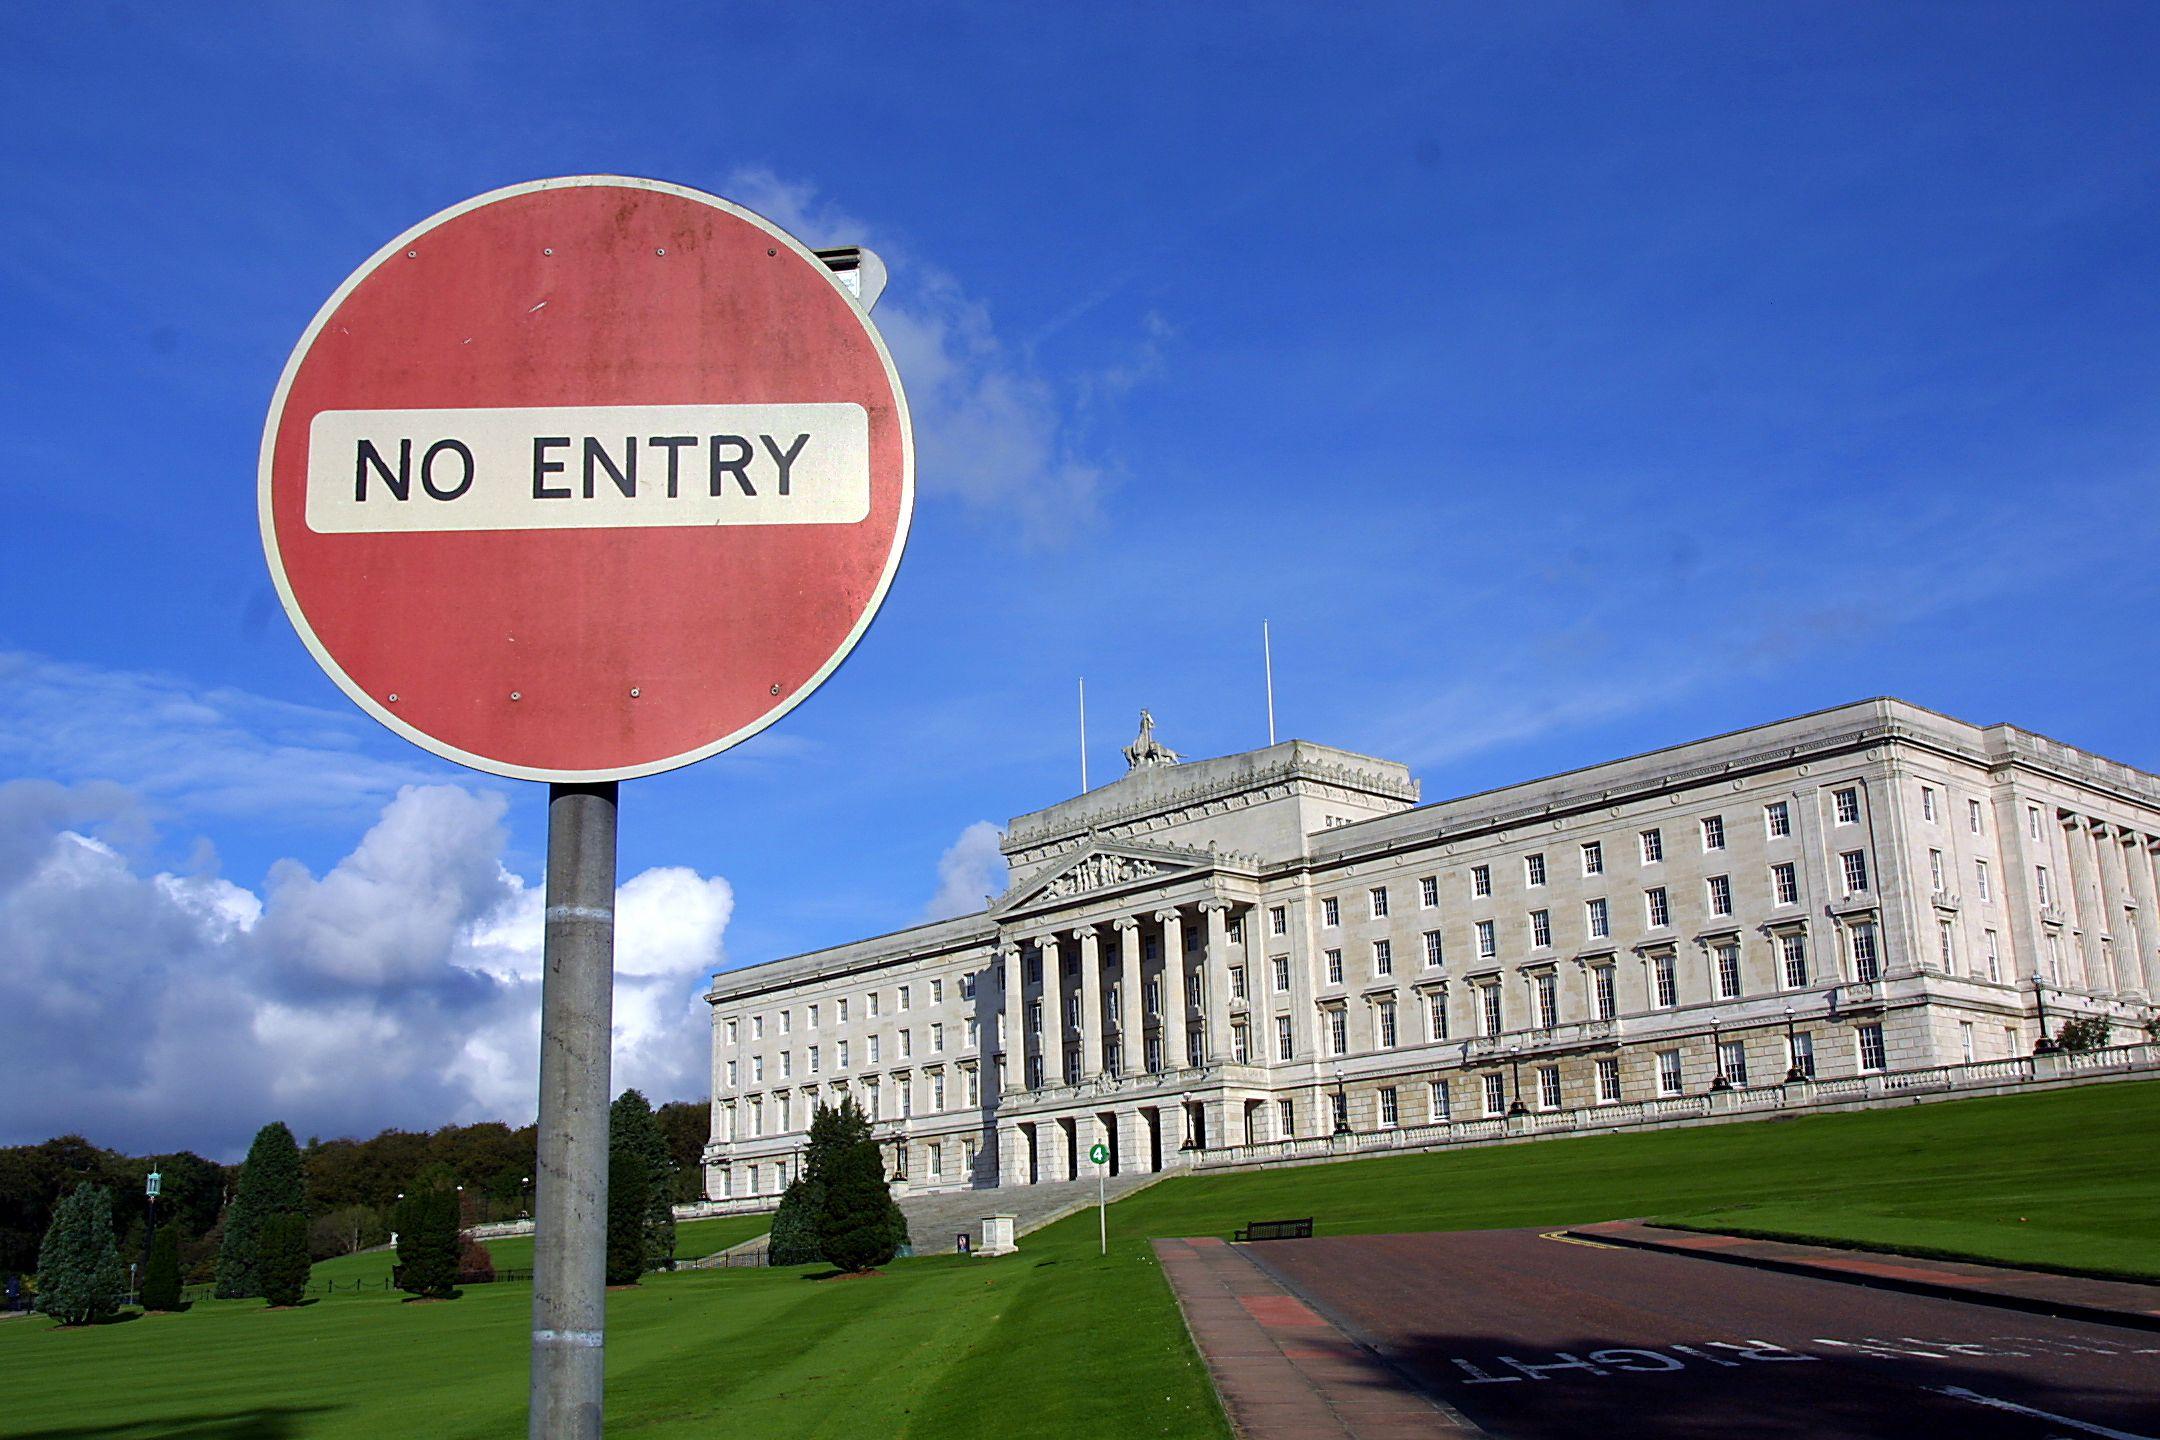 "\""UNCERTAIN TIMES AHEAD: Parliament Buildings at Stormont."